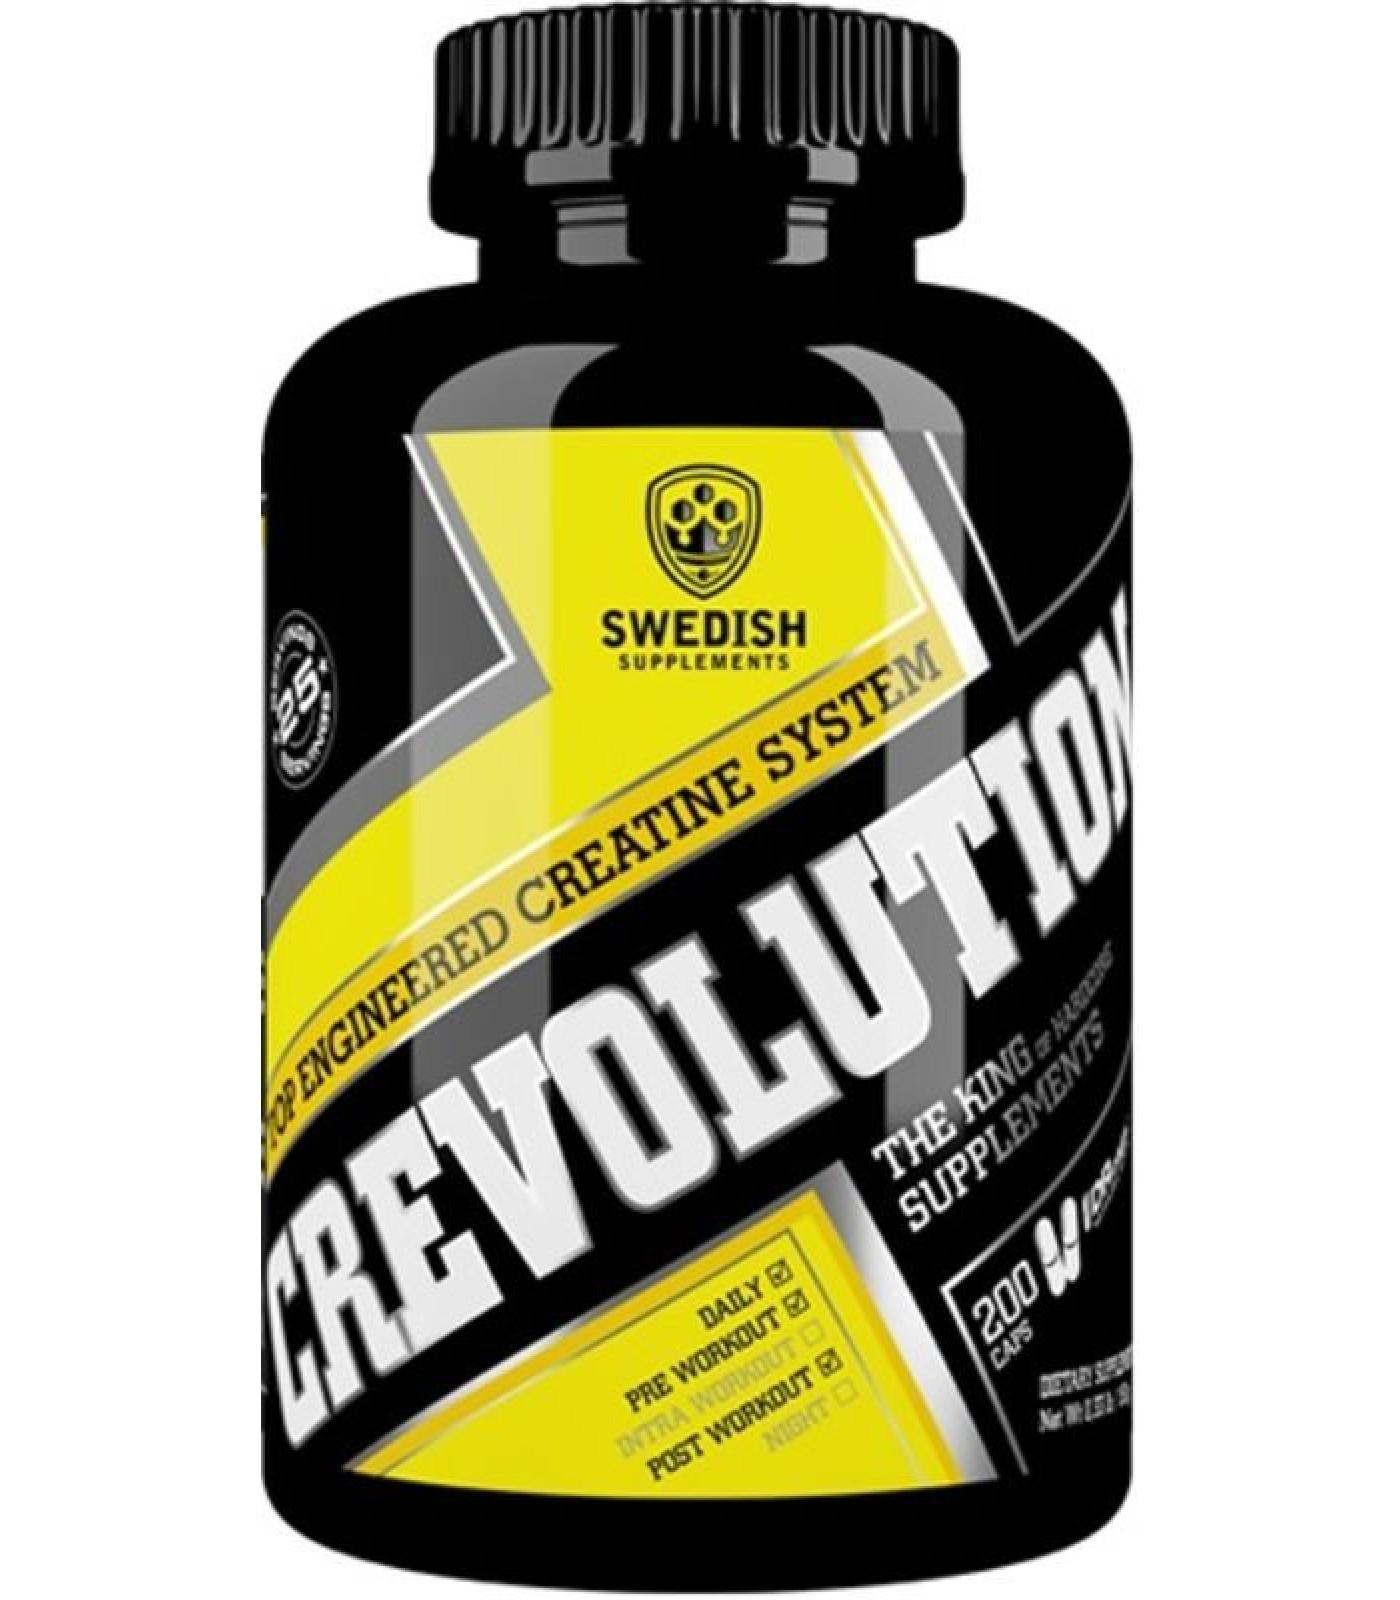 SWEDISH Supplements - Crevolution Magnum / Watt's Up